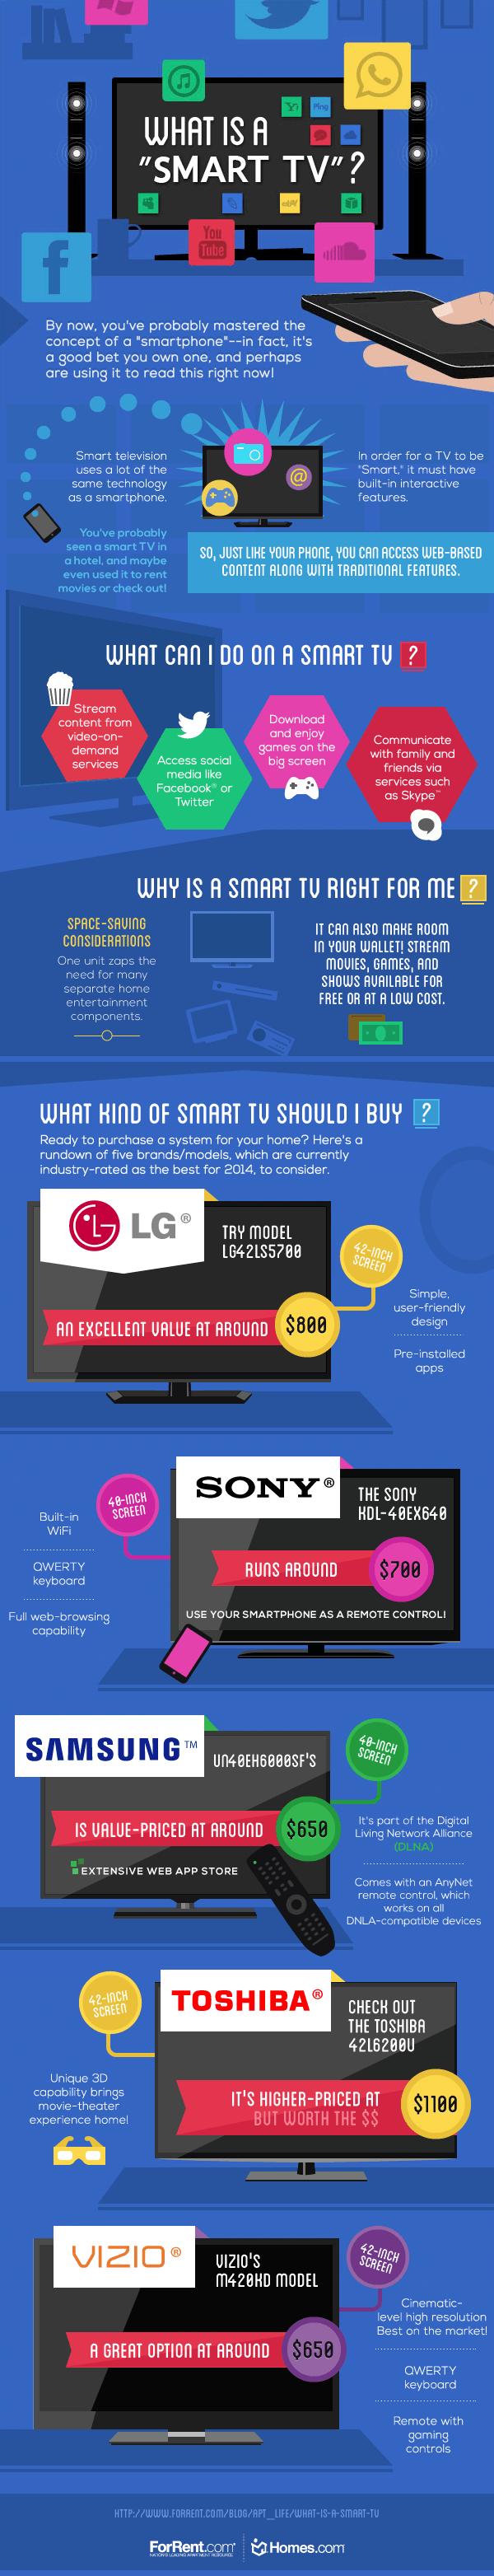 What-is-a-Smart-TV-ForRent.com-Homes.com_